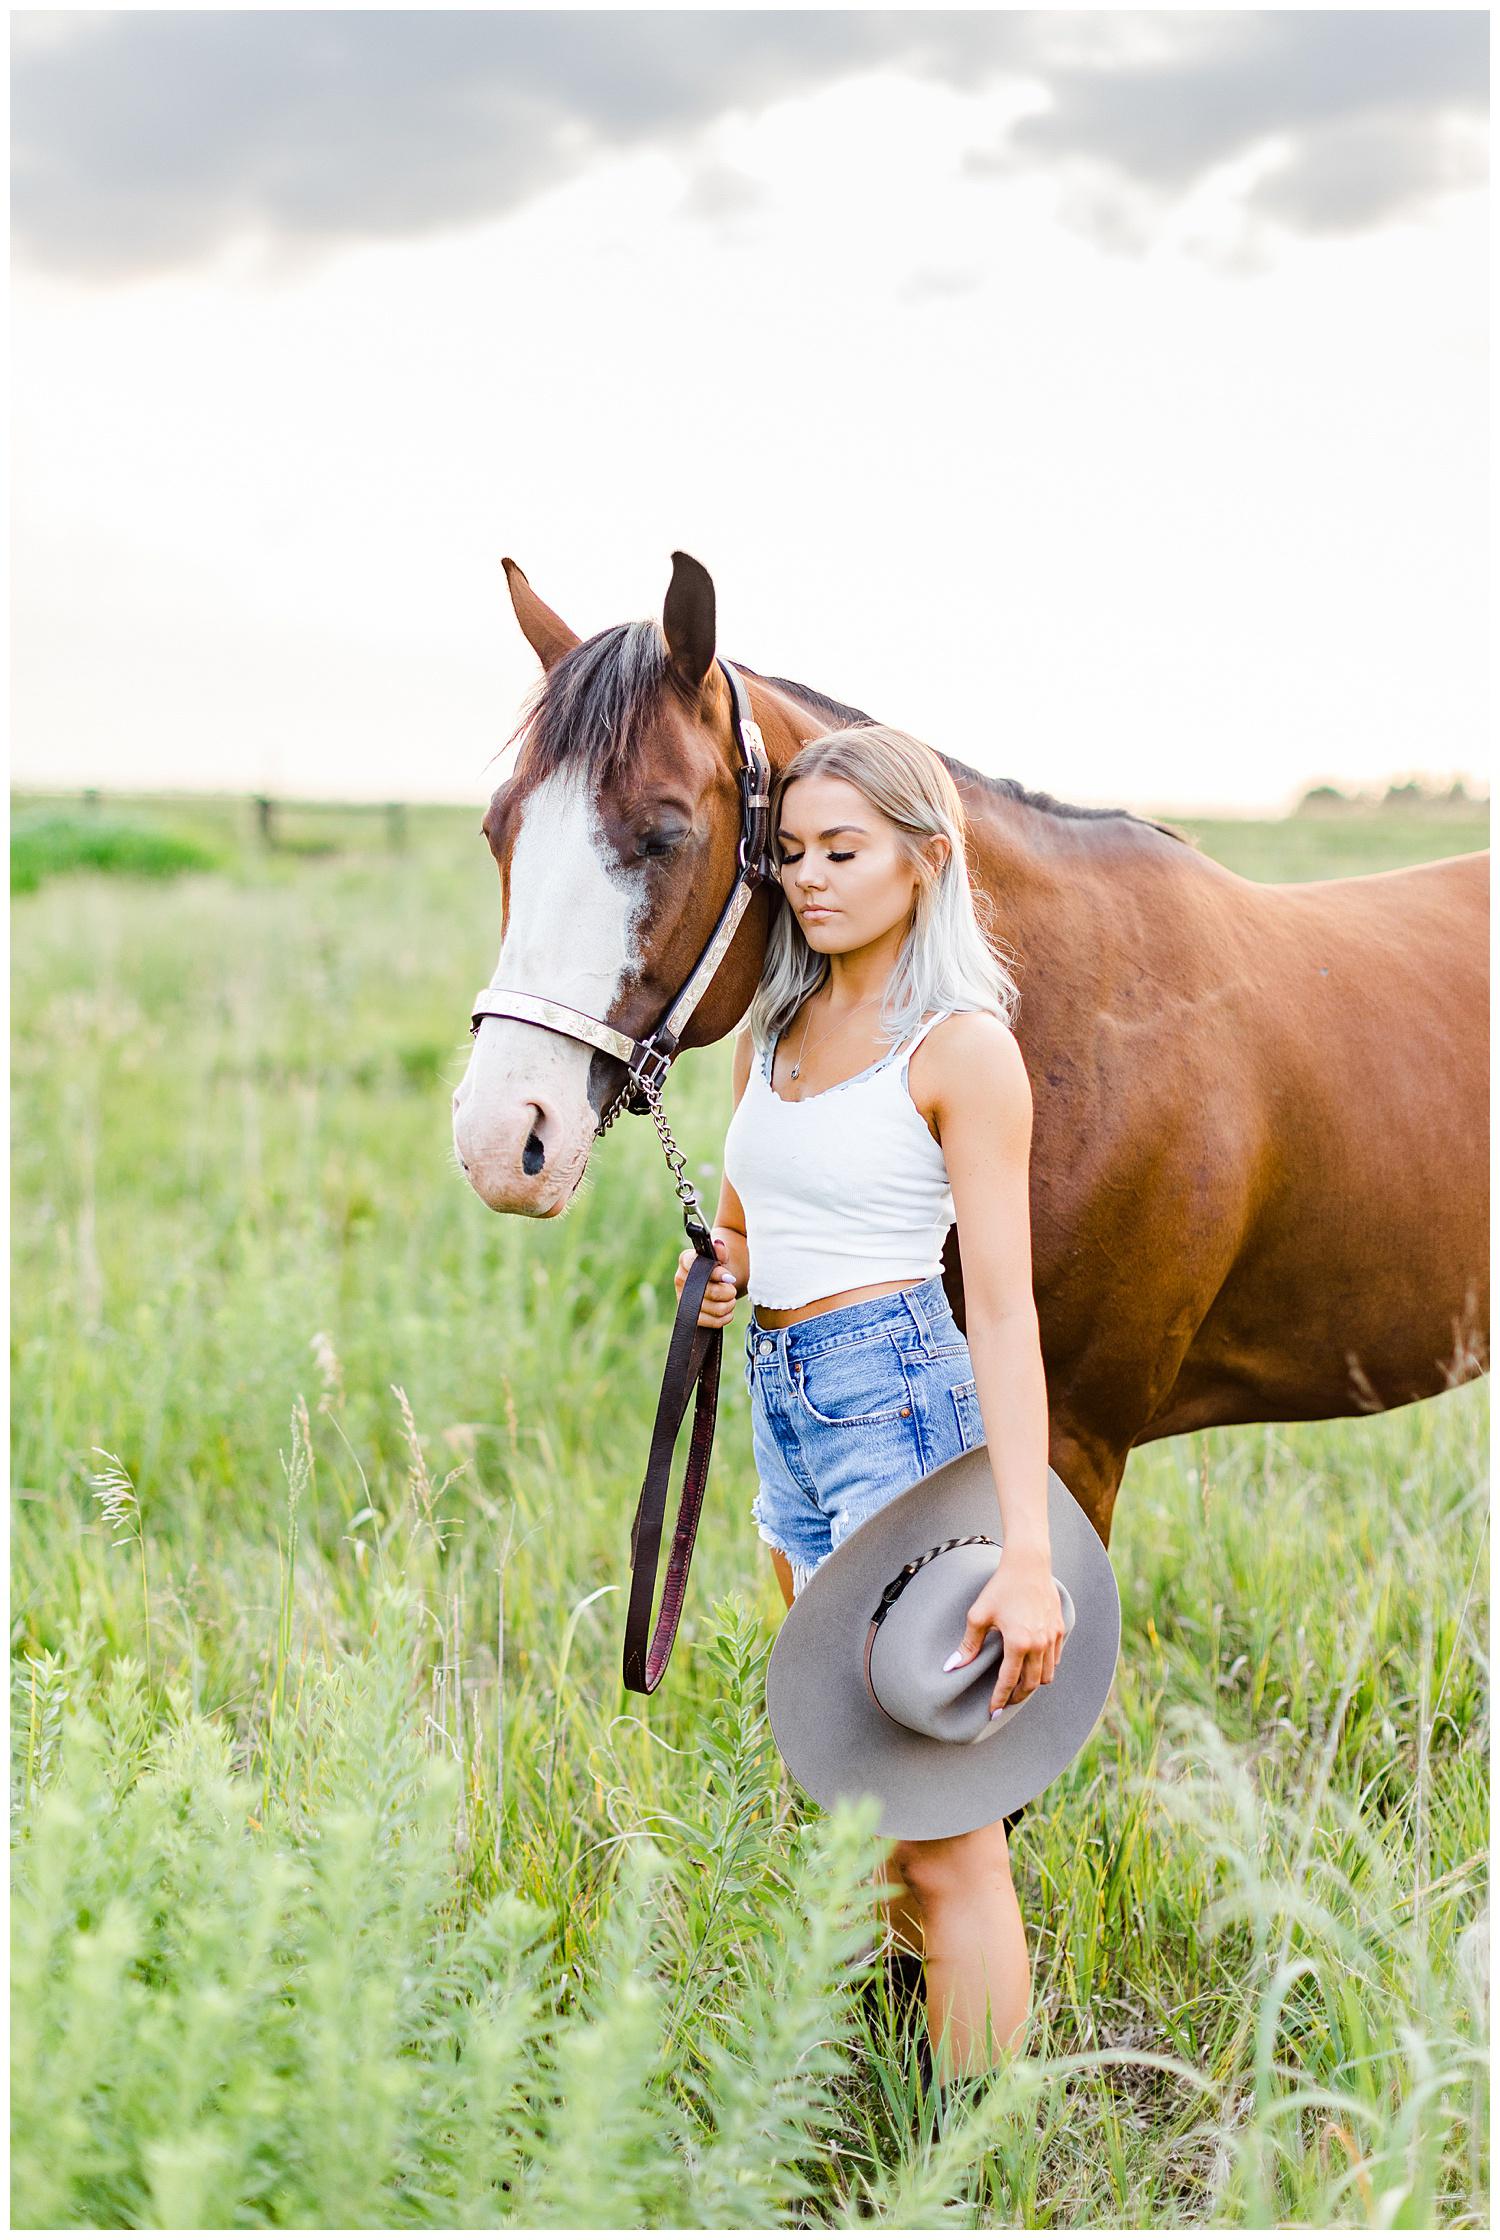 Addison snuggles Miss Flirty the horse in a grassy field   CB Studio